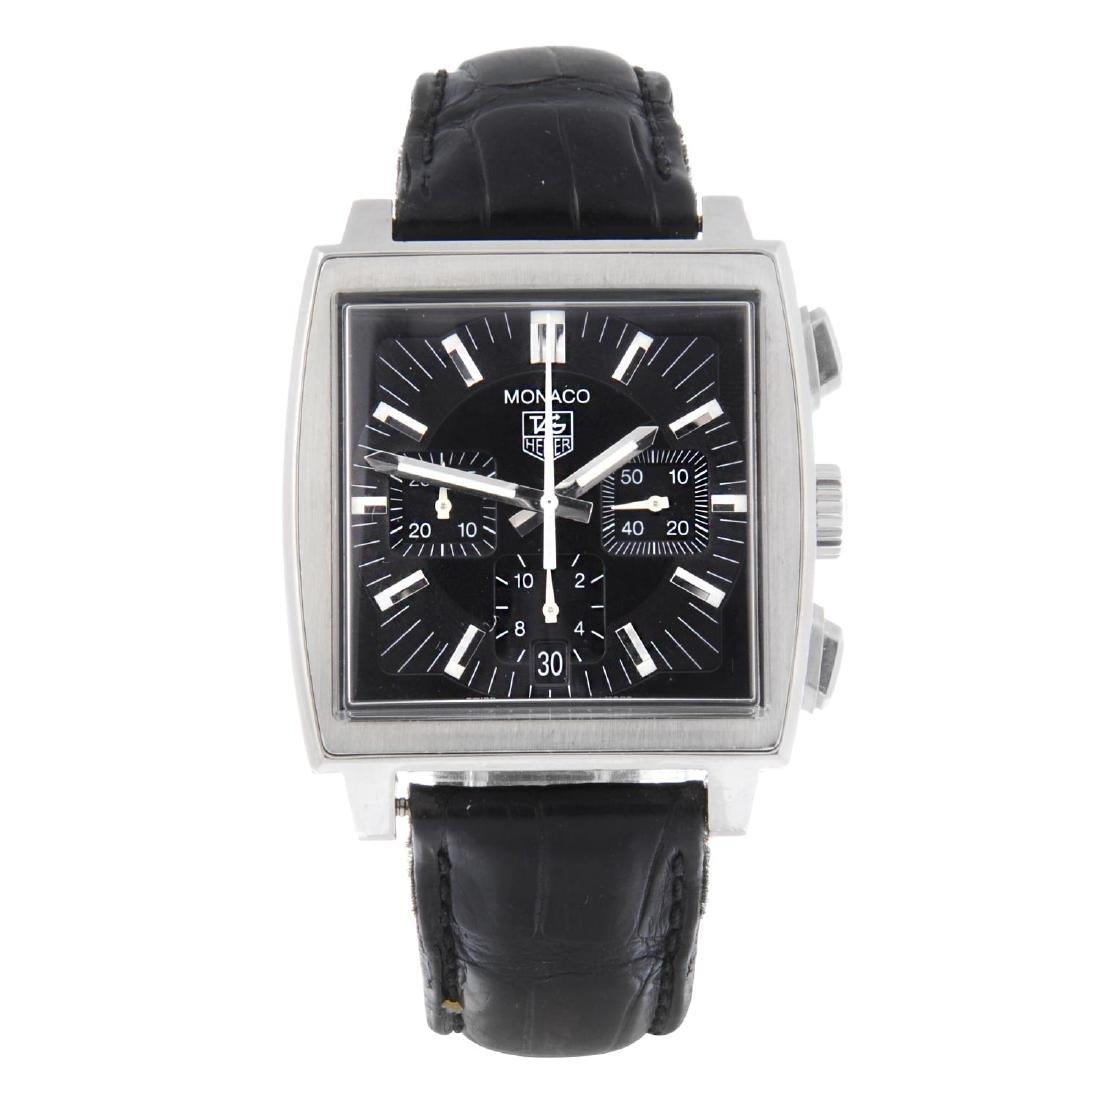 TAG HEUER - a gentleman's Monaco chronograph wrist